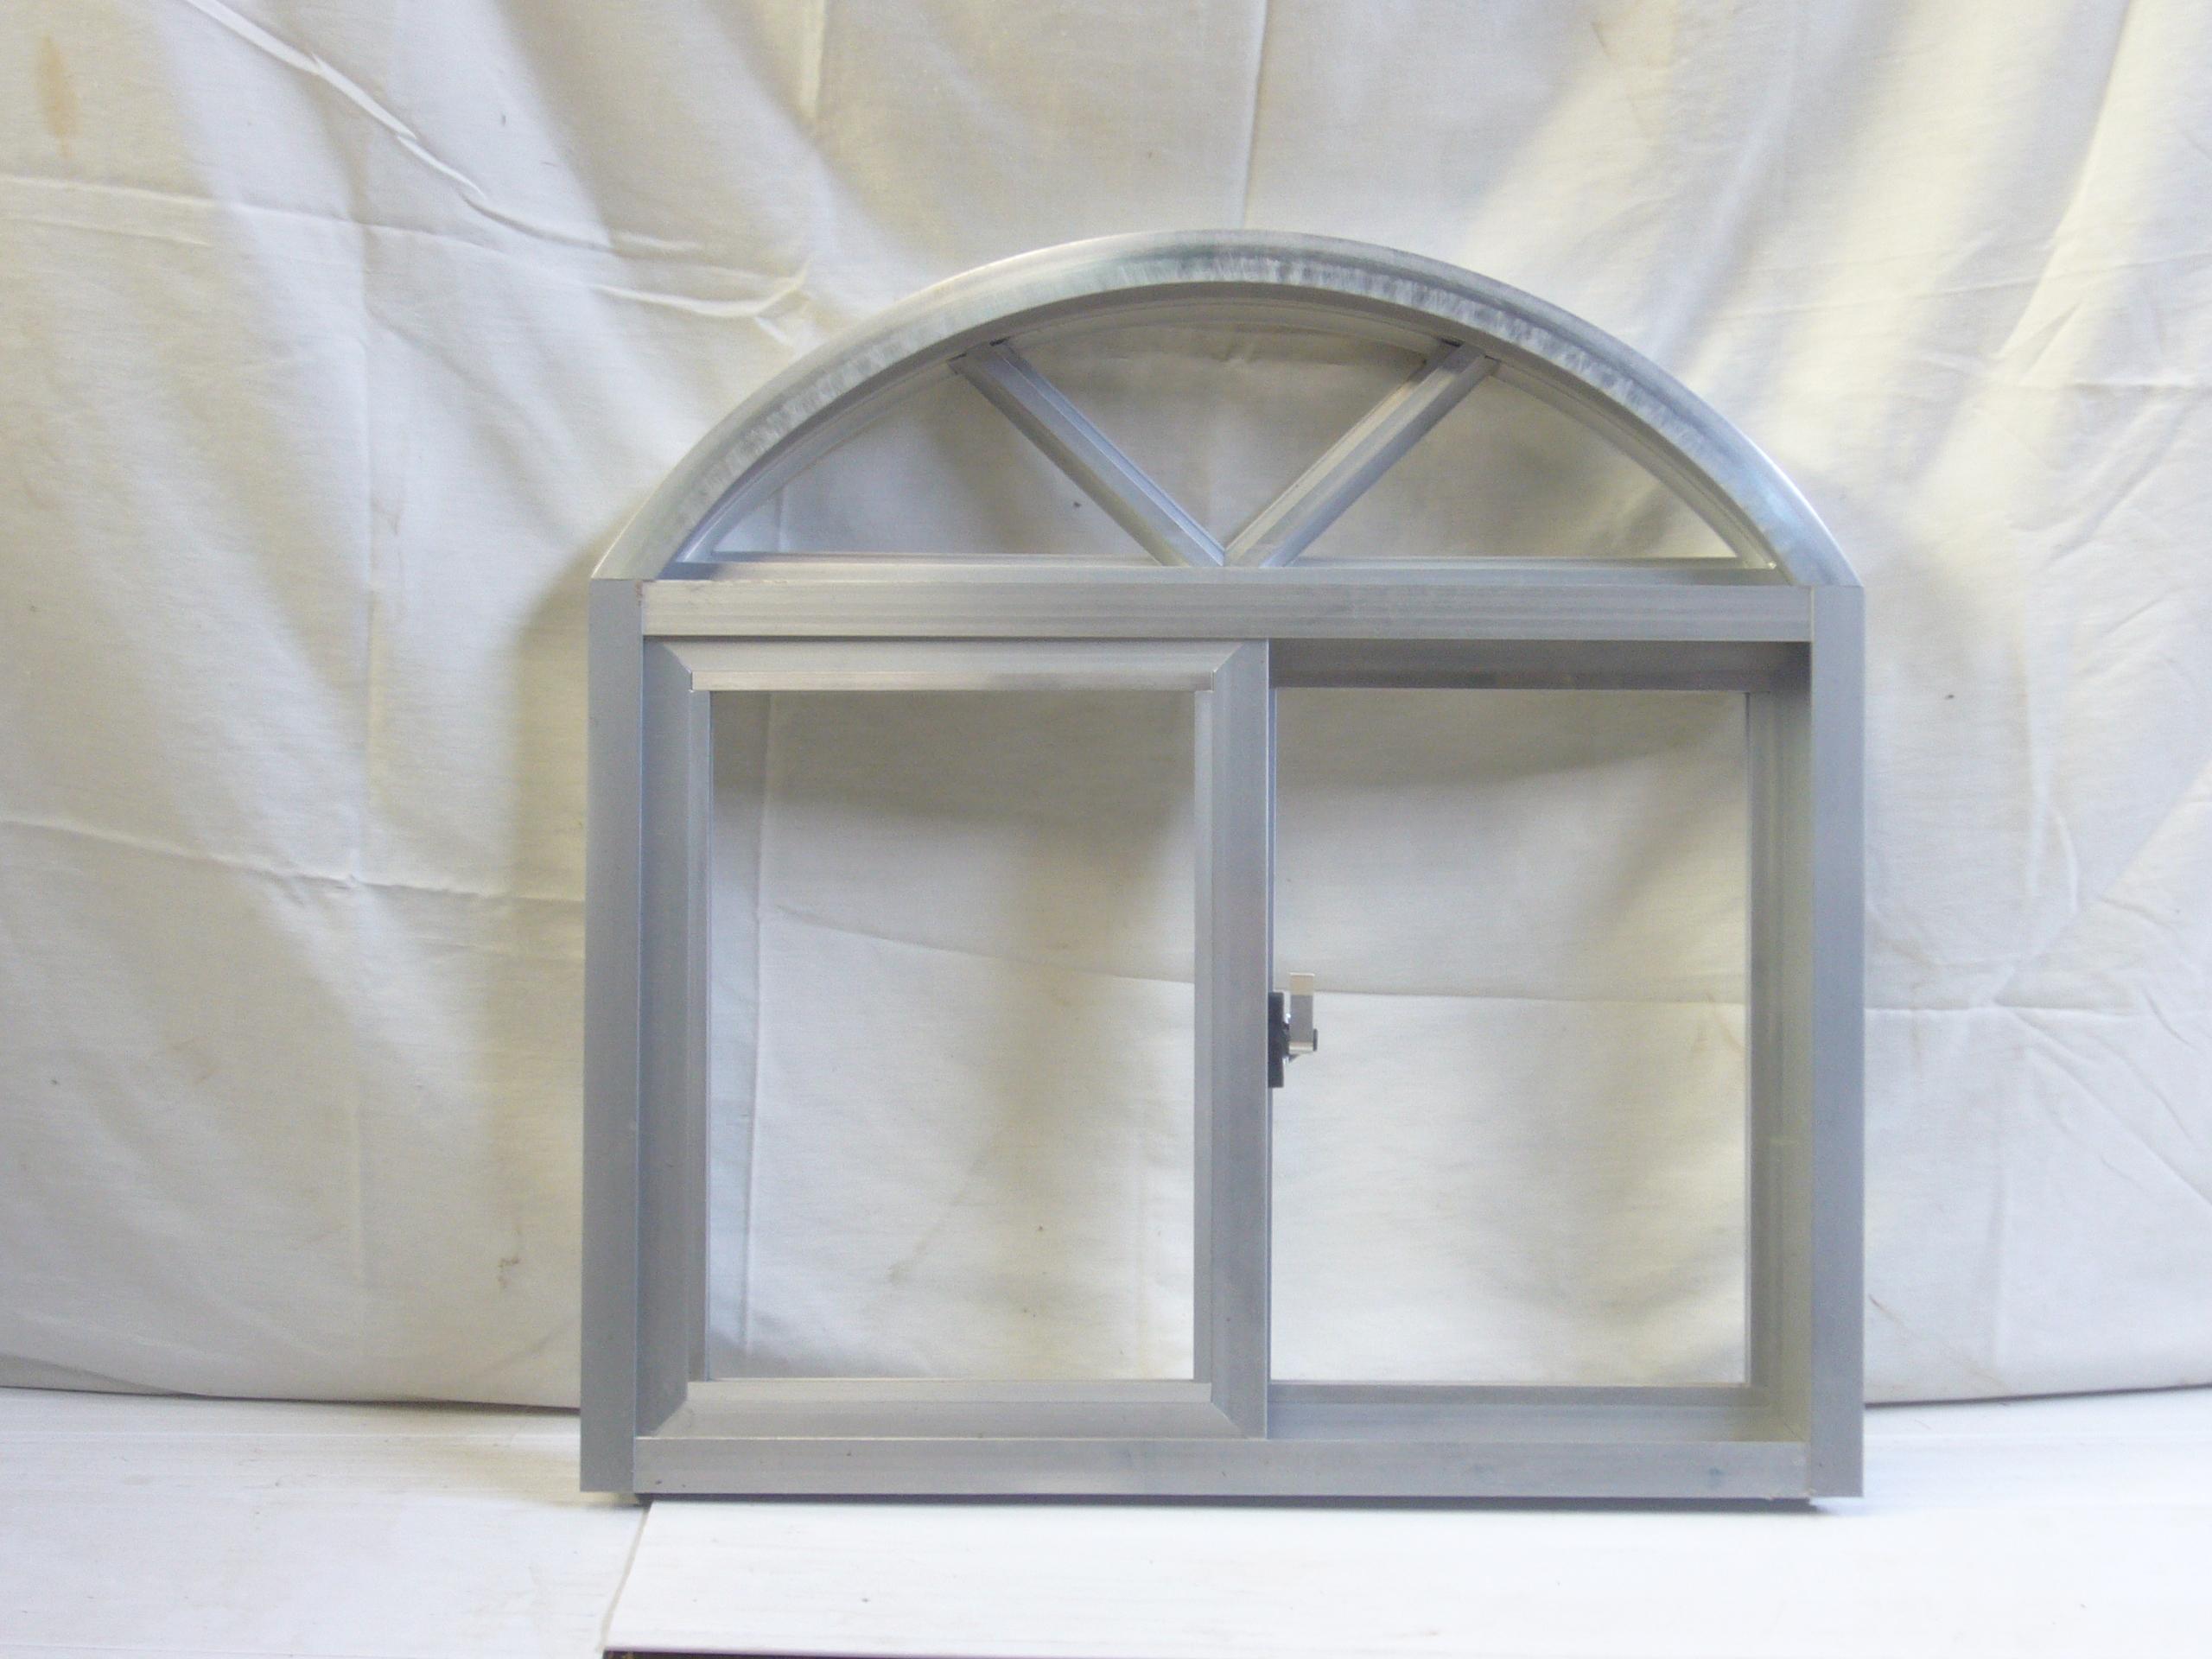 Janelas aluminio #5A6471 2560 1920